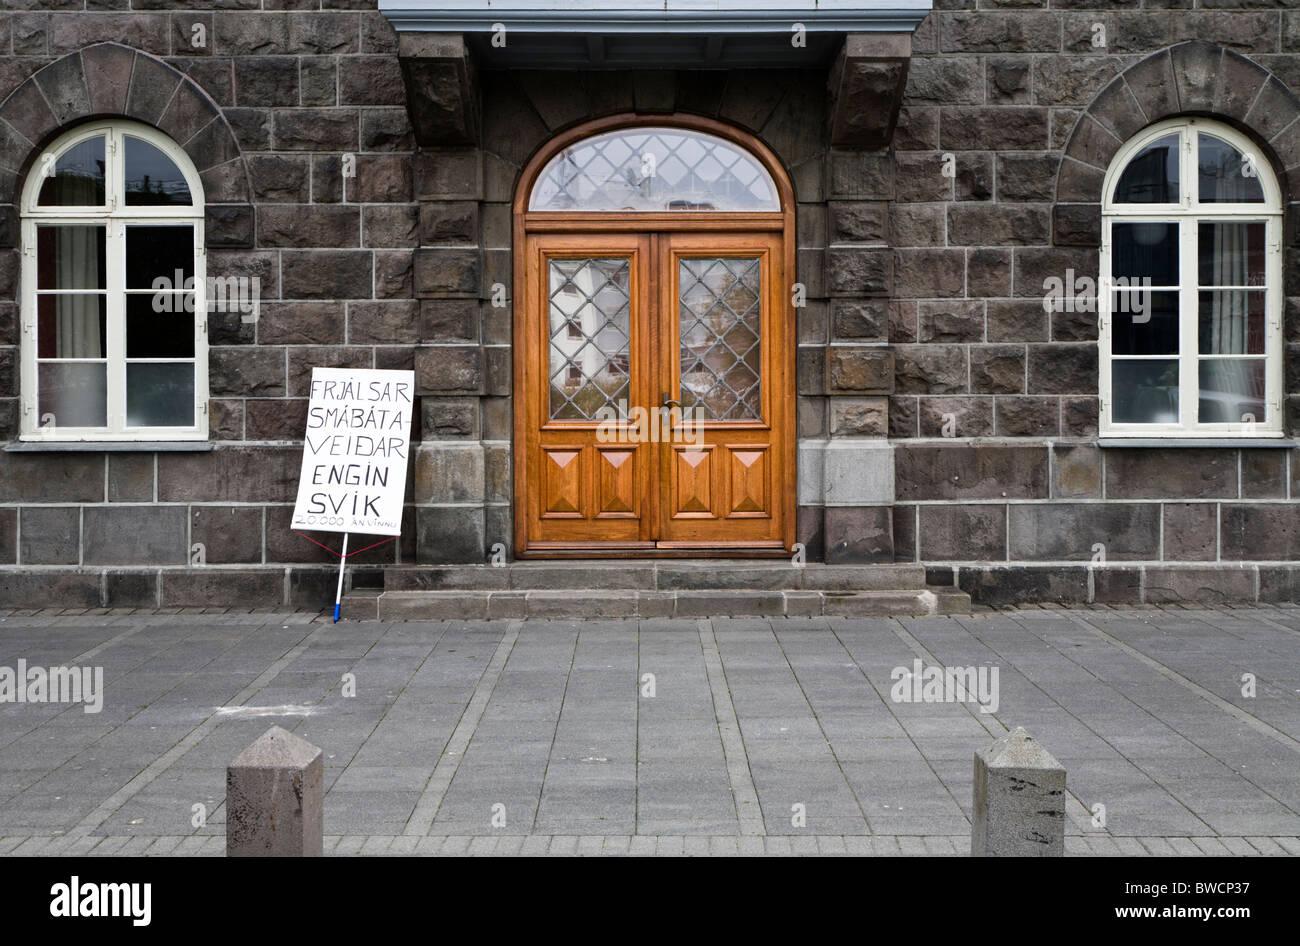 Reykjavik - Iceland, June 9, 2009: A demonstrators sign outside the Icelandic Parliament, Althingi. - Stock Image